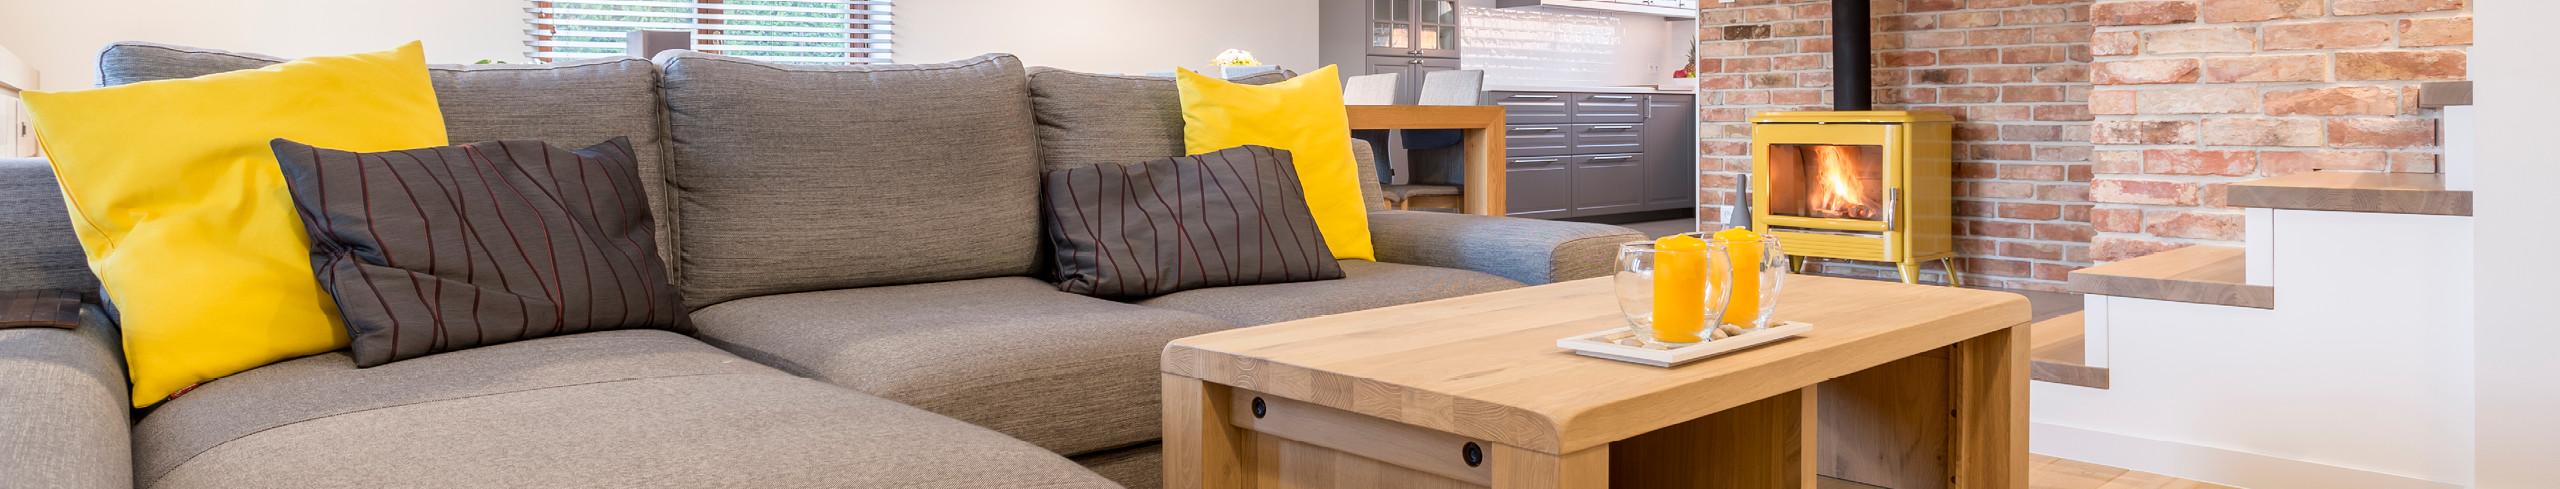 Catalog   Great Deals on designer sofas   Sofa Giant Doncaster